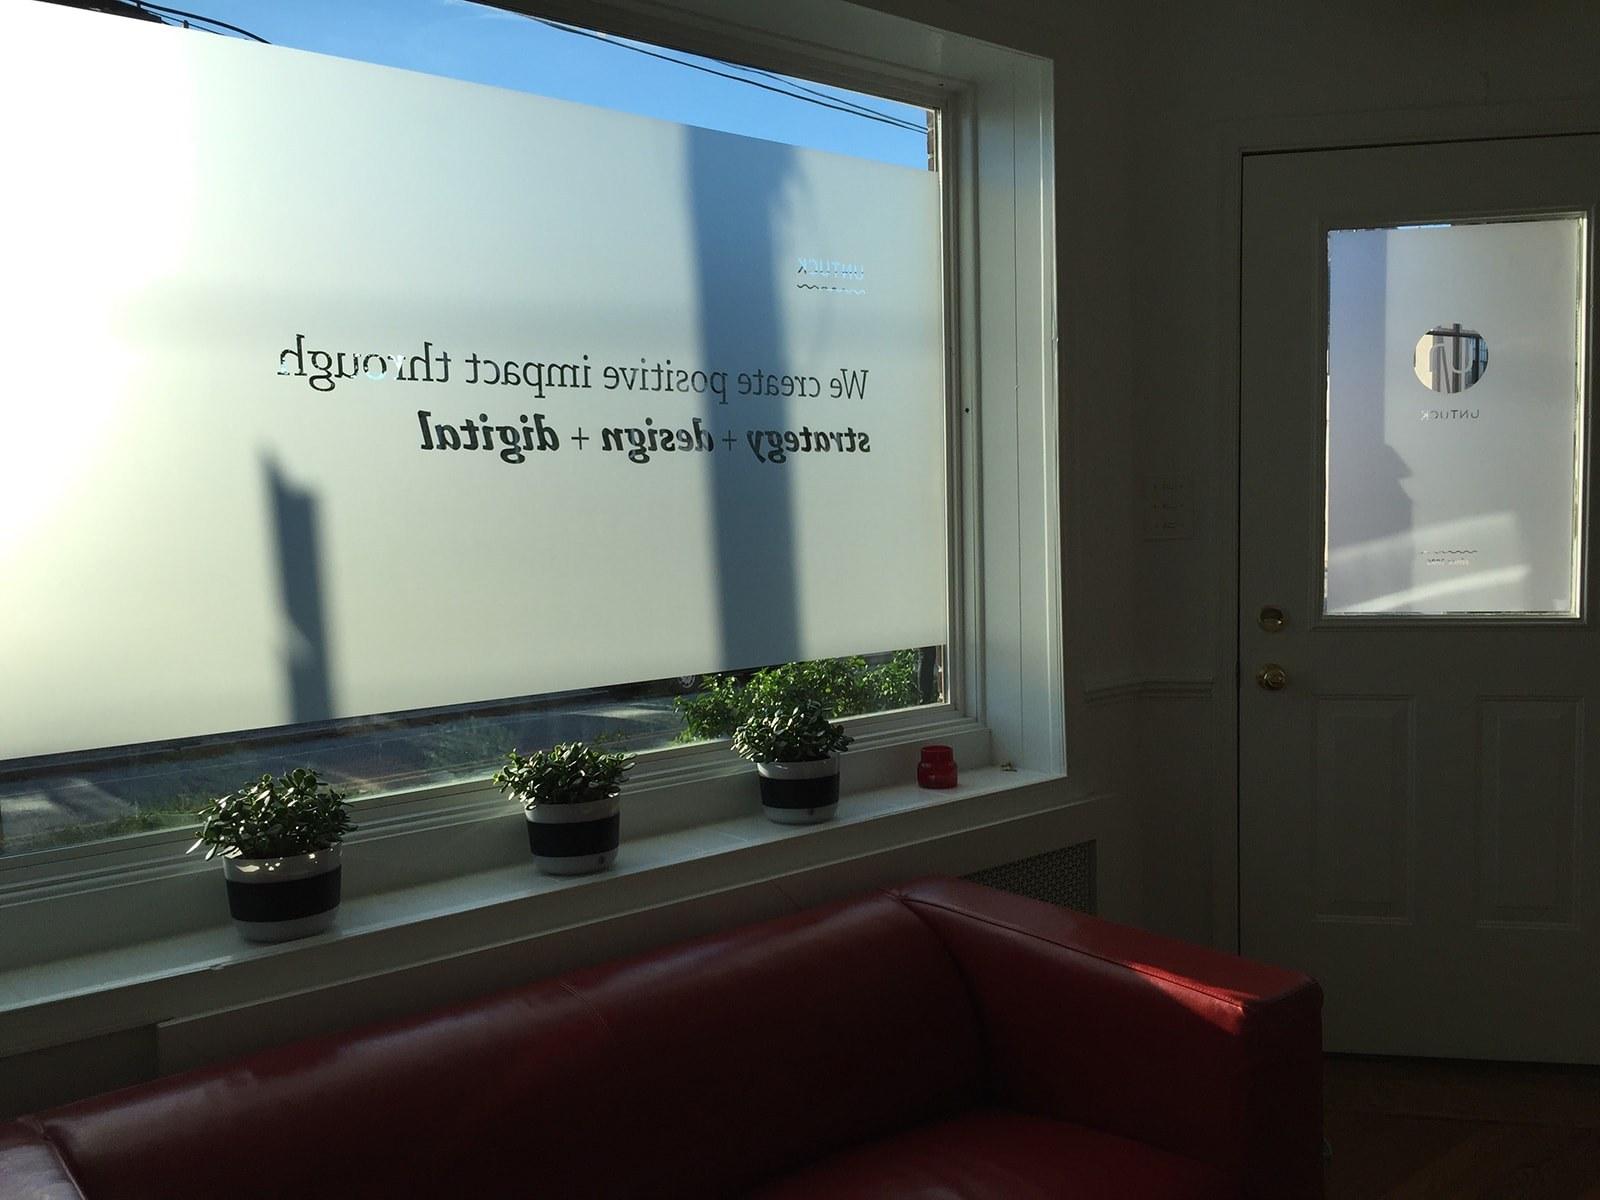 Untuck front window - strategy, design, digital